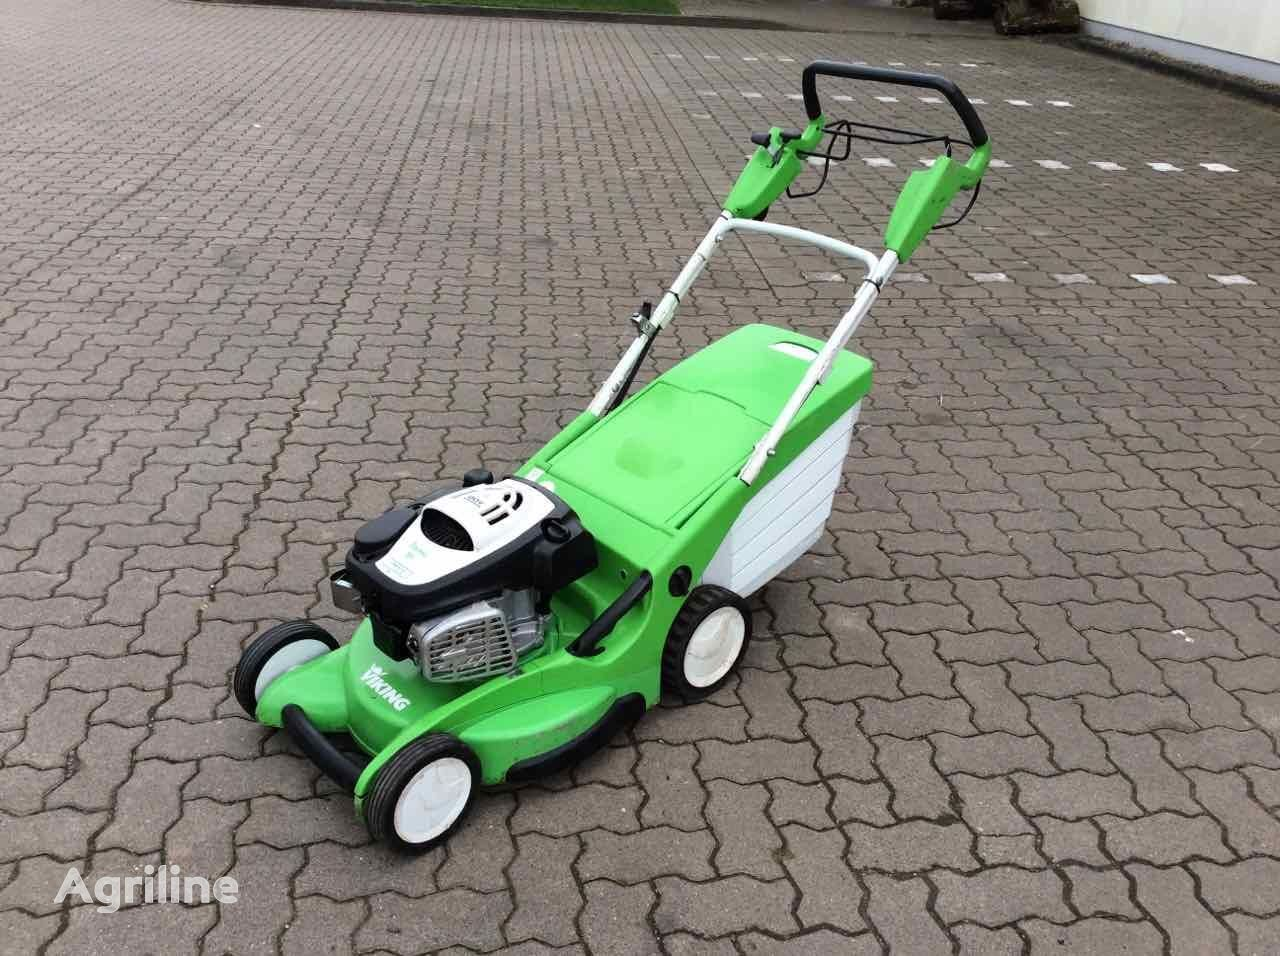 VIKING MB 655 VS lawn mower